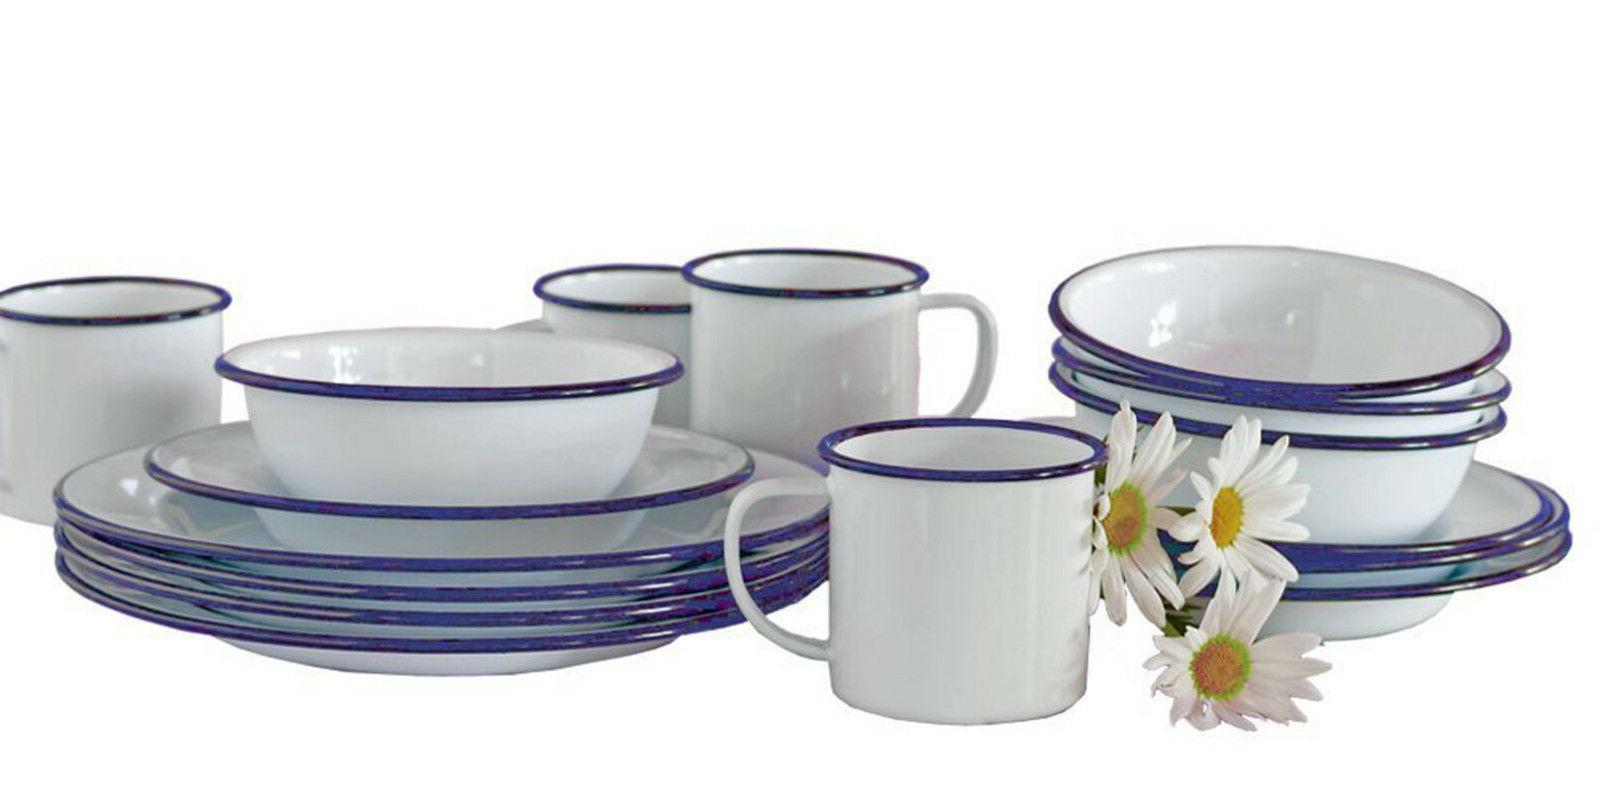 vintage style enamelware 16 pc starter dinnerware